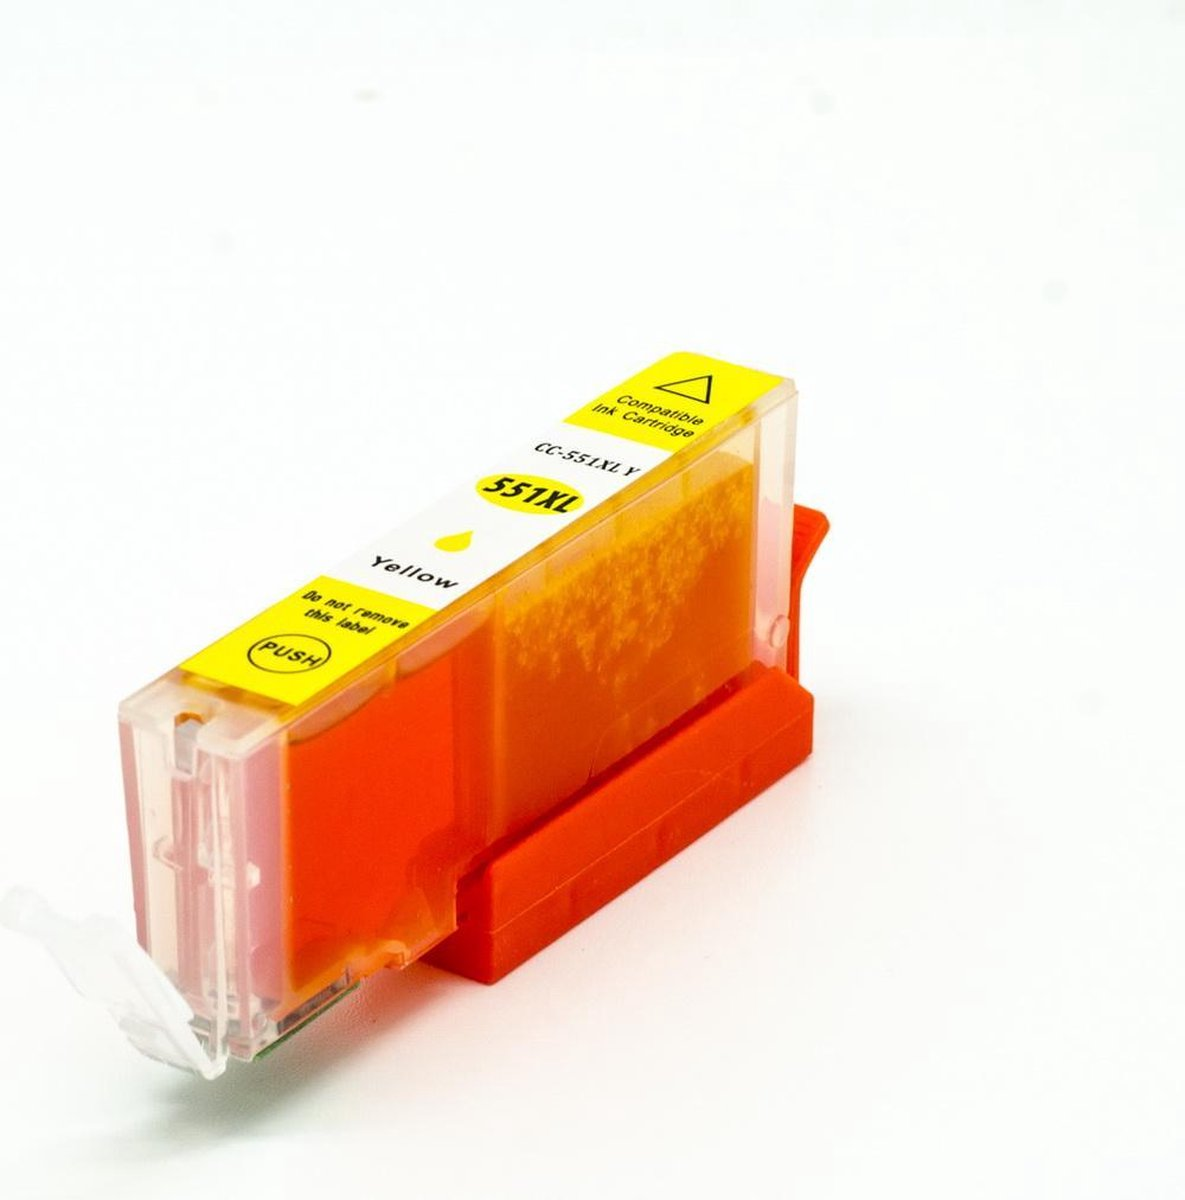 Bol Com Inktdag Inktcartridge Voor Canon Pgi 550xl Cli 551xl Canon 550 Xl Pgbk 551